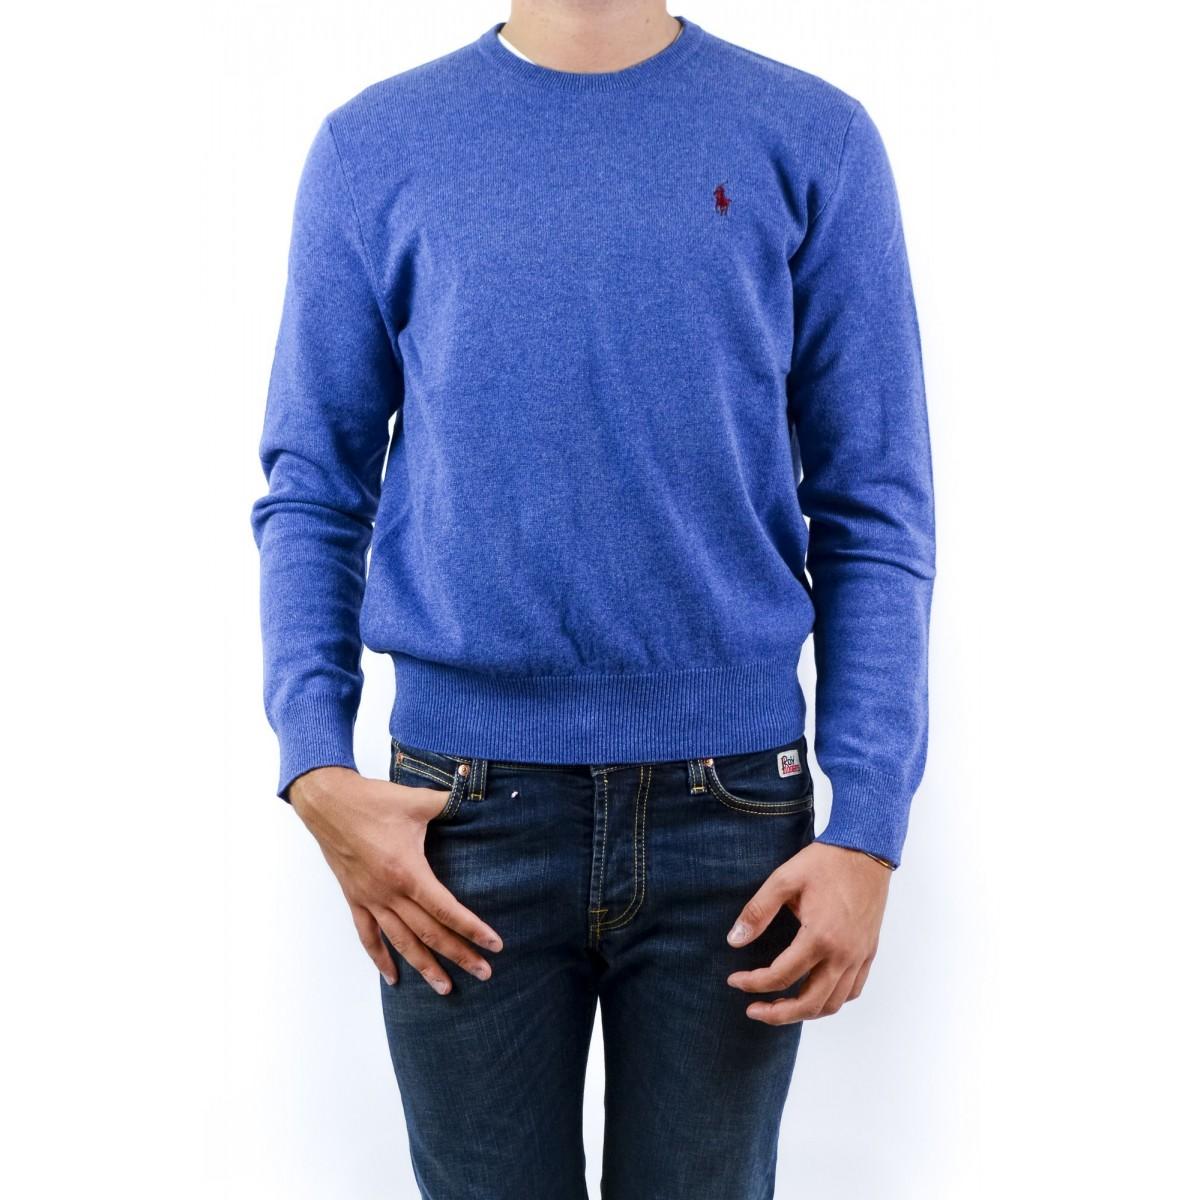 Maglia uomo Ralph lauren - A42scn07w8793 A488Y - Melange azzurro